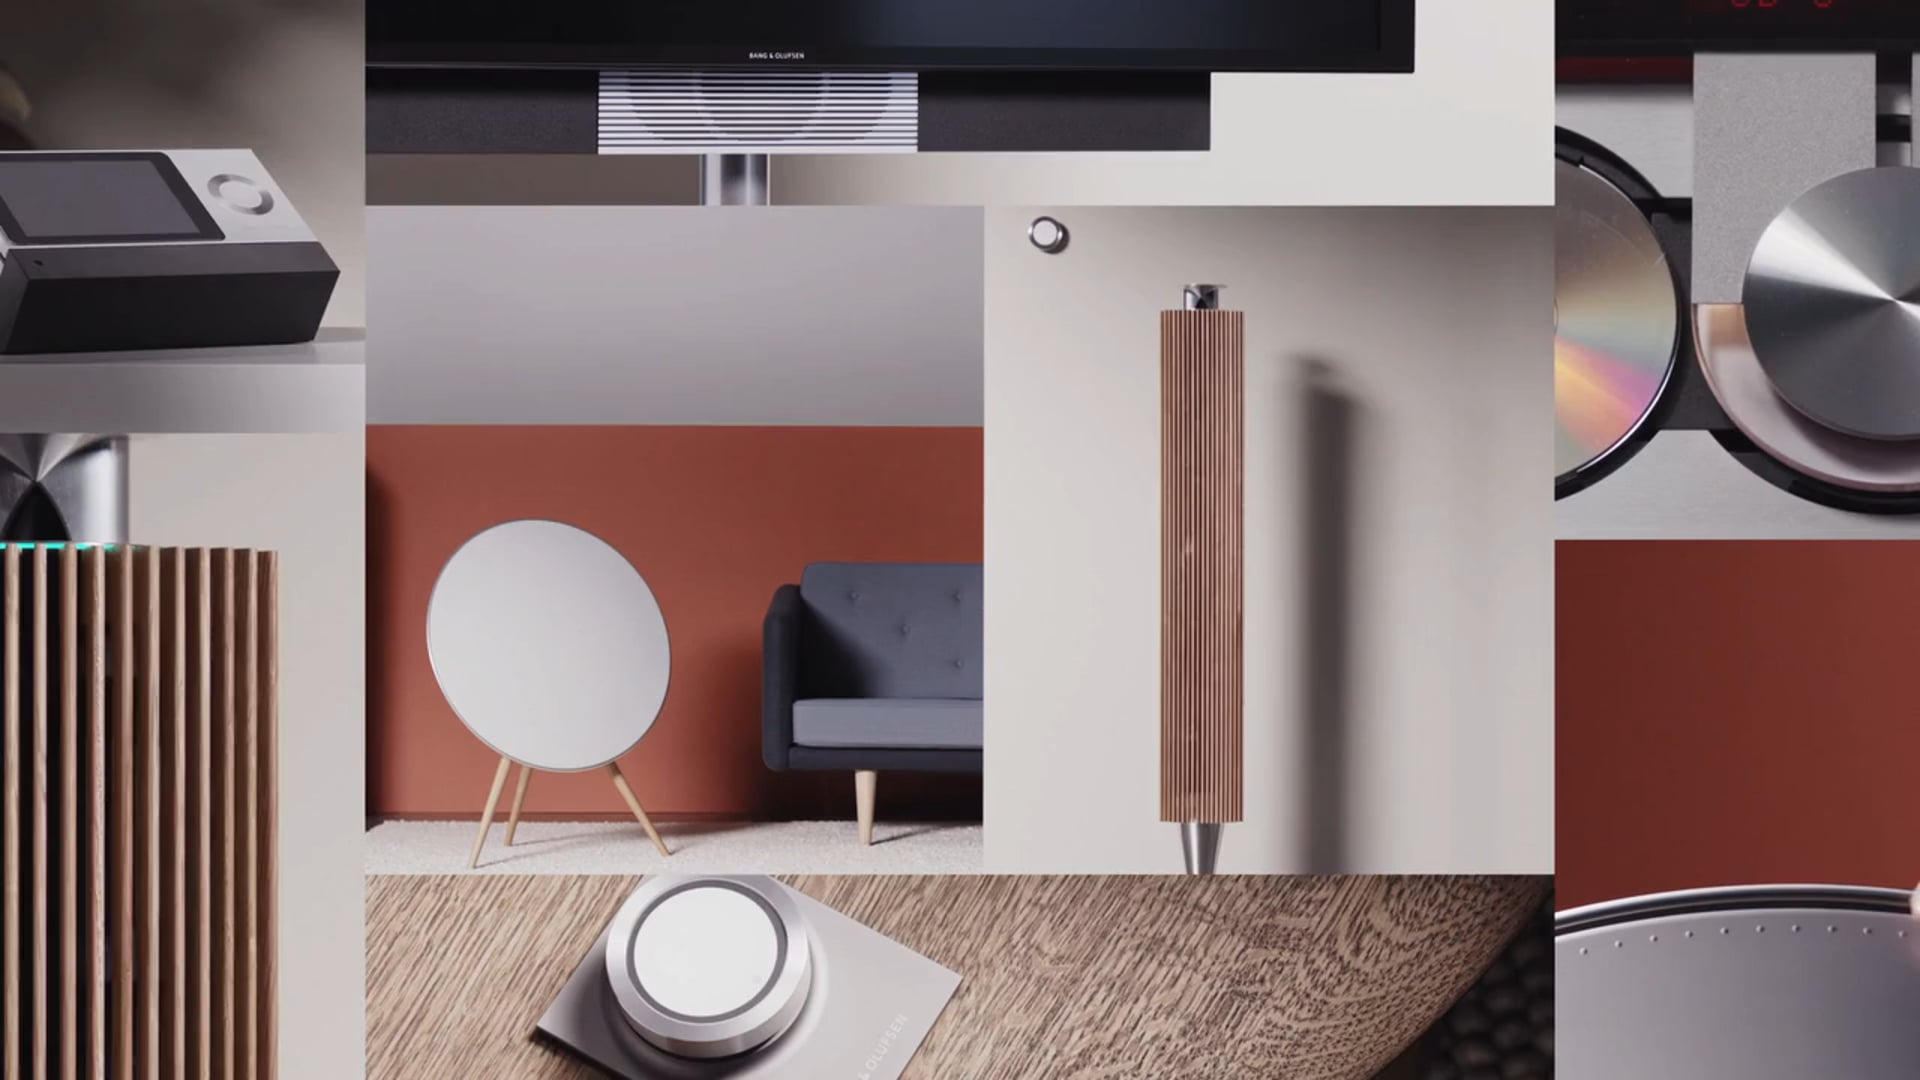 Bang & Olufsen - Beolink Multiroom